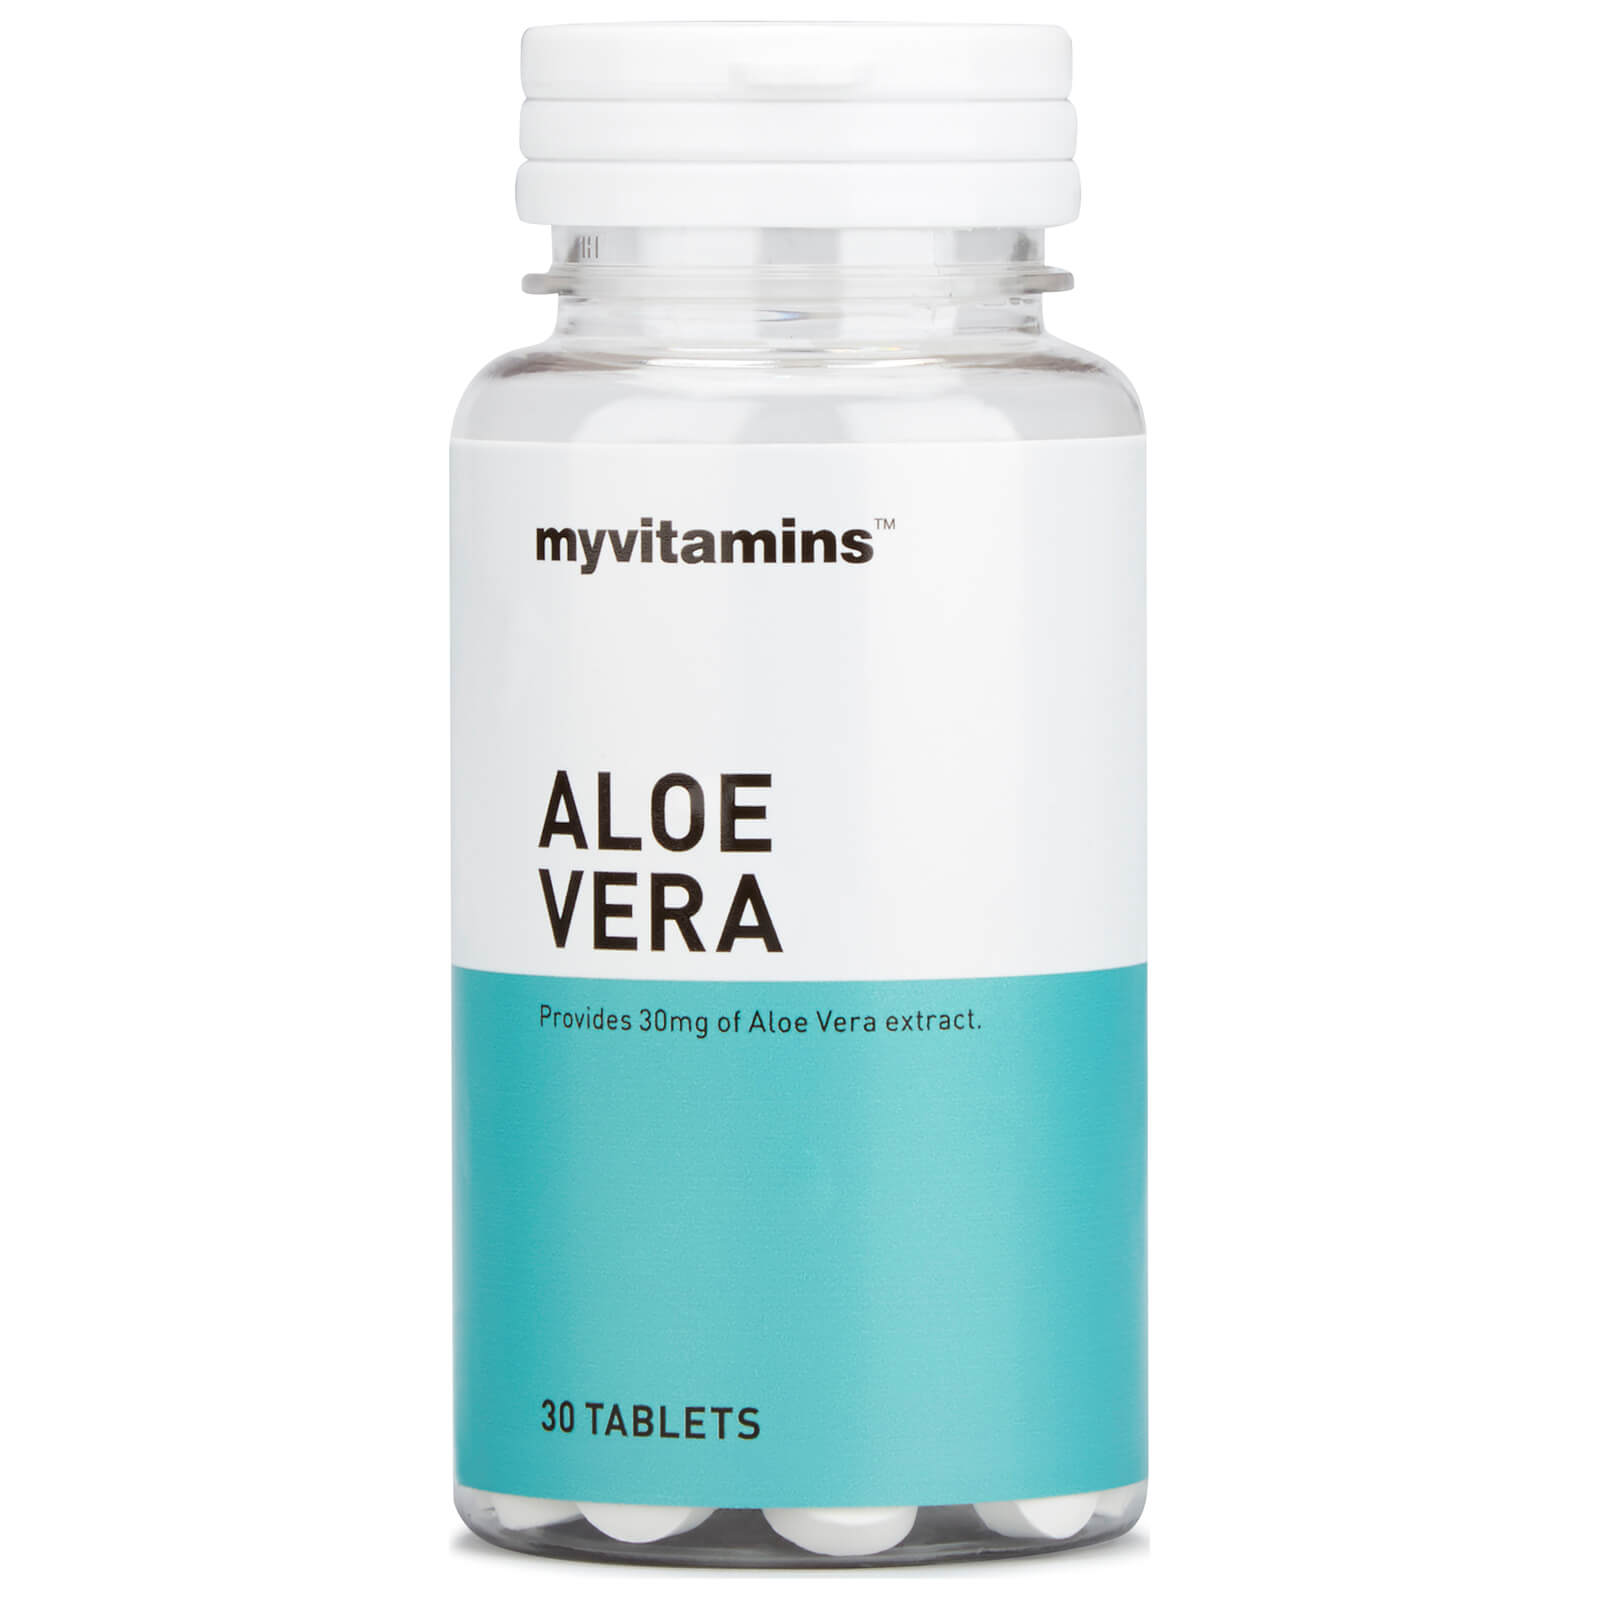 Myvitamins Aloe Vera (30 Tablets) Myvitamins